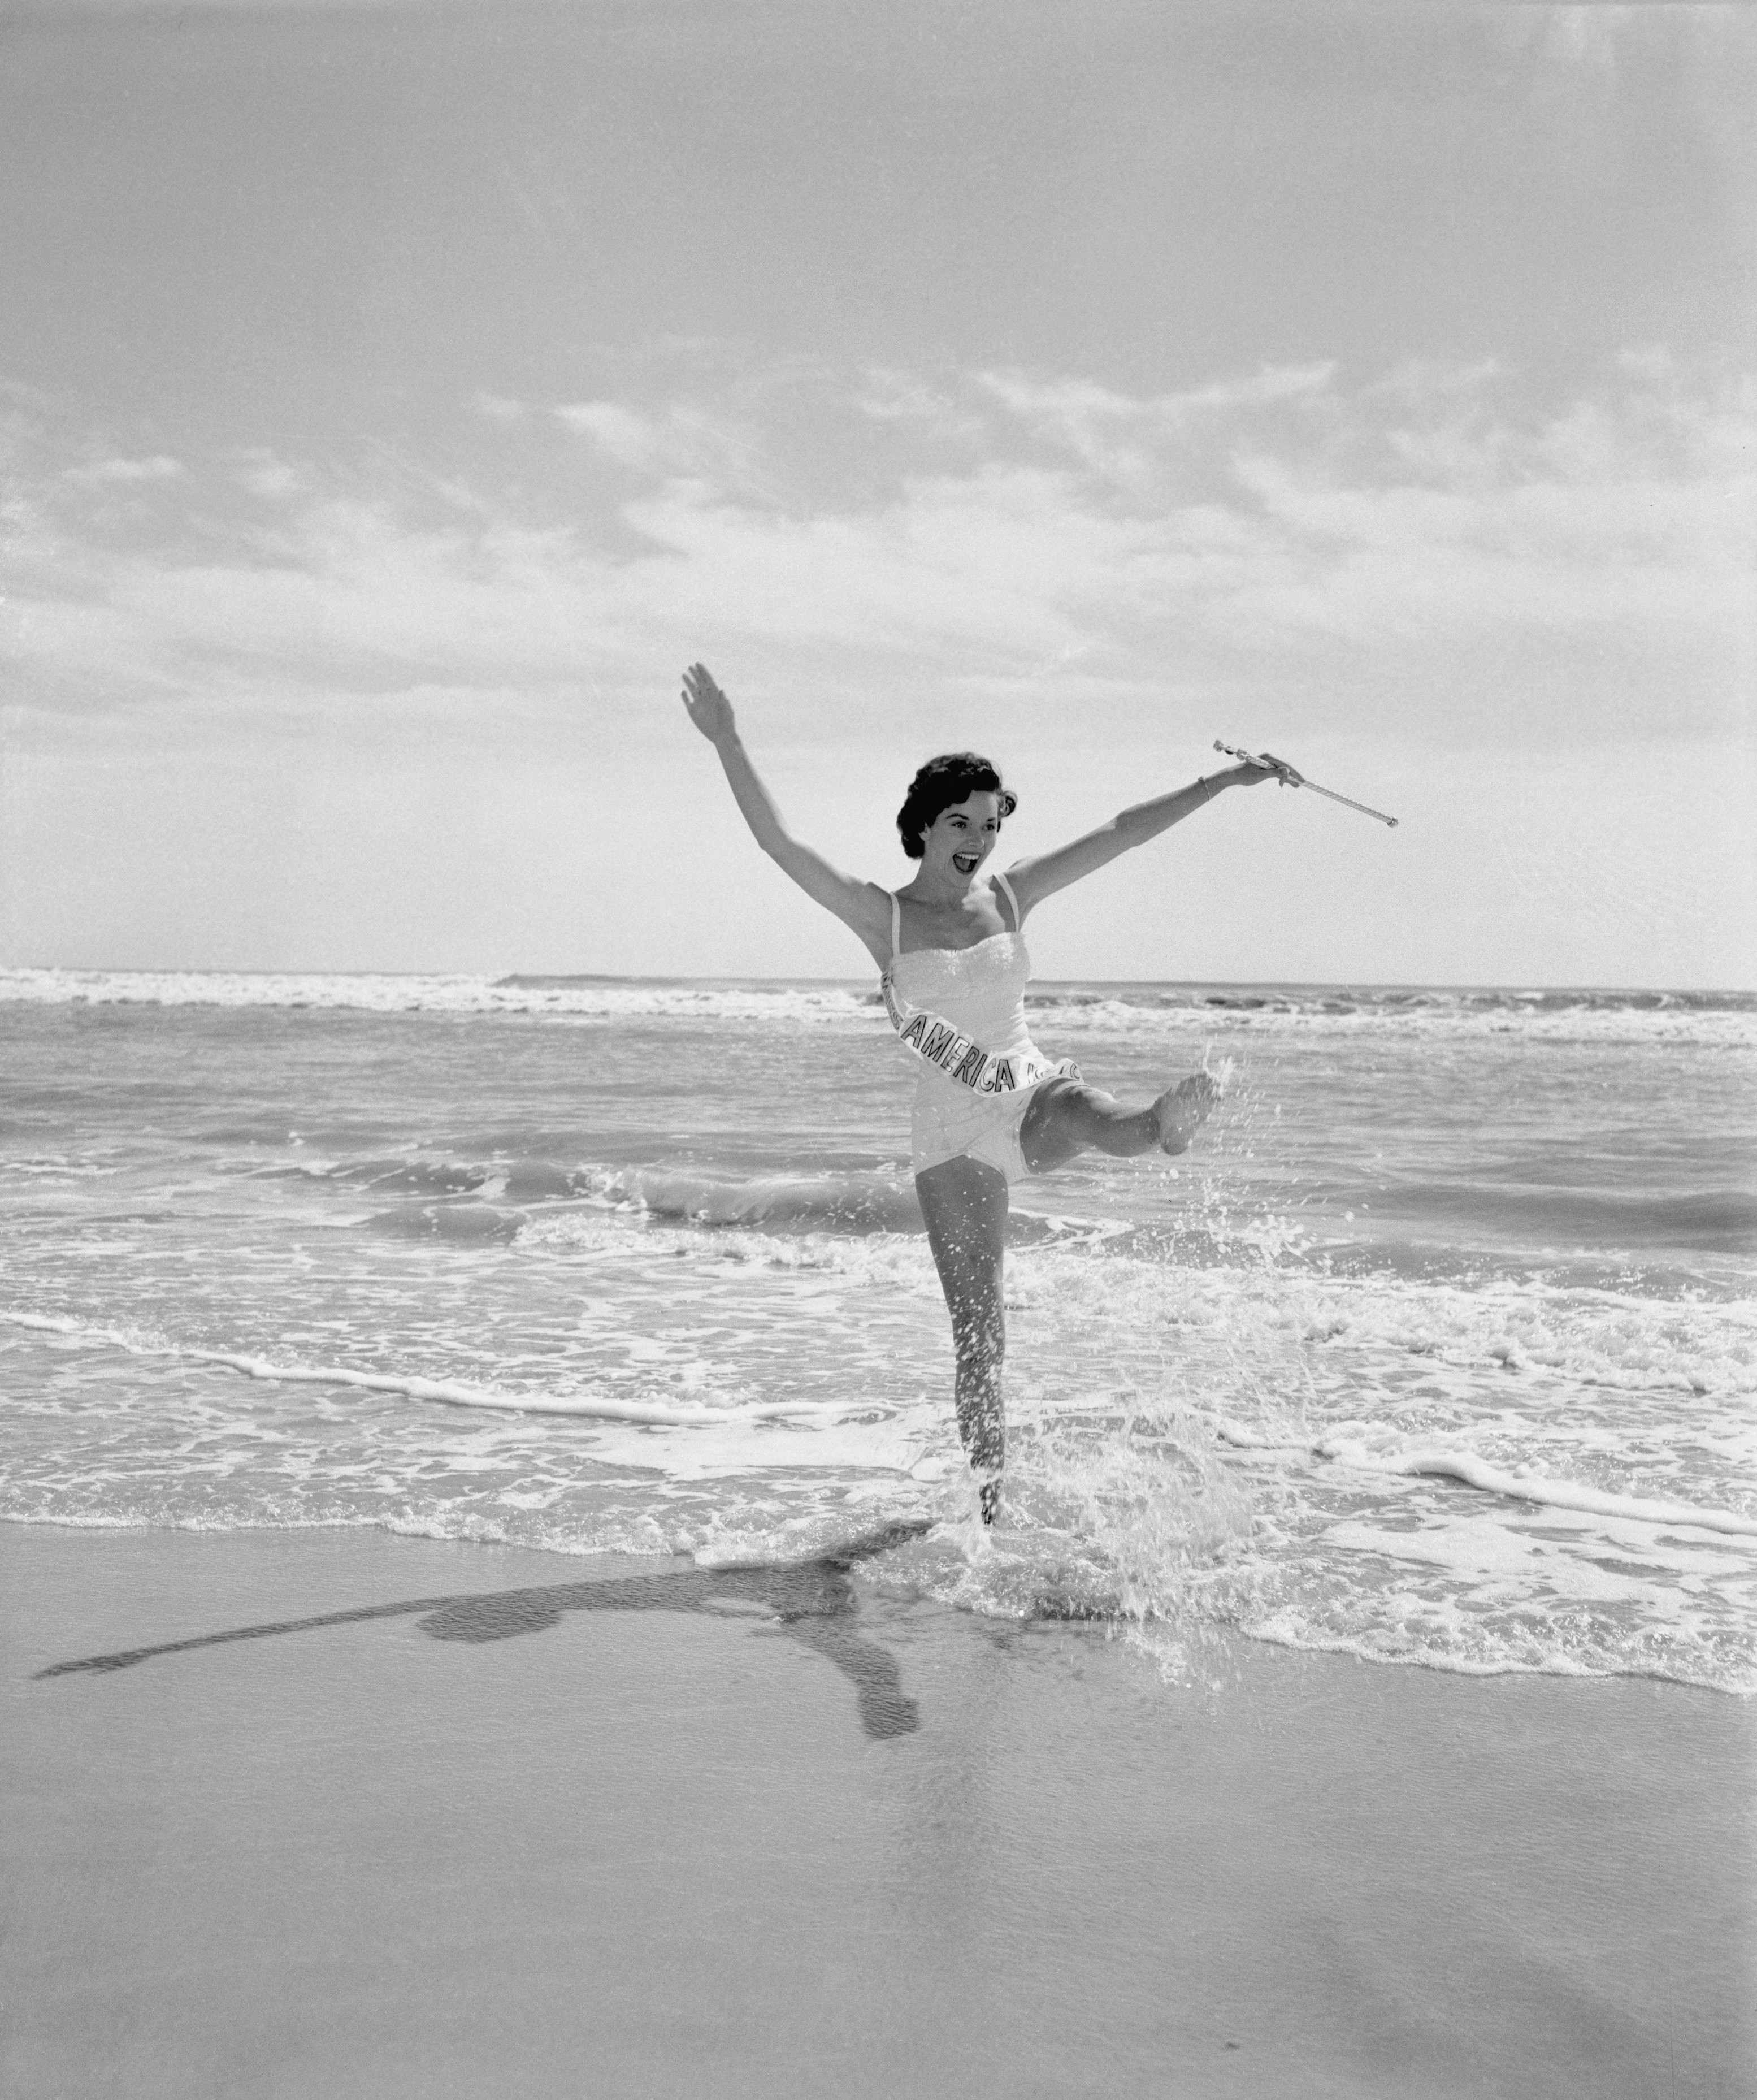 1955: Lee Meriwether from San Francisco